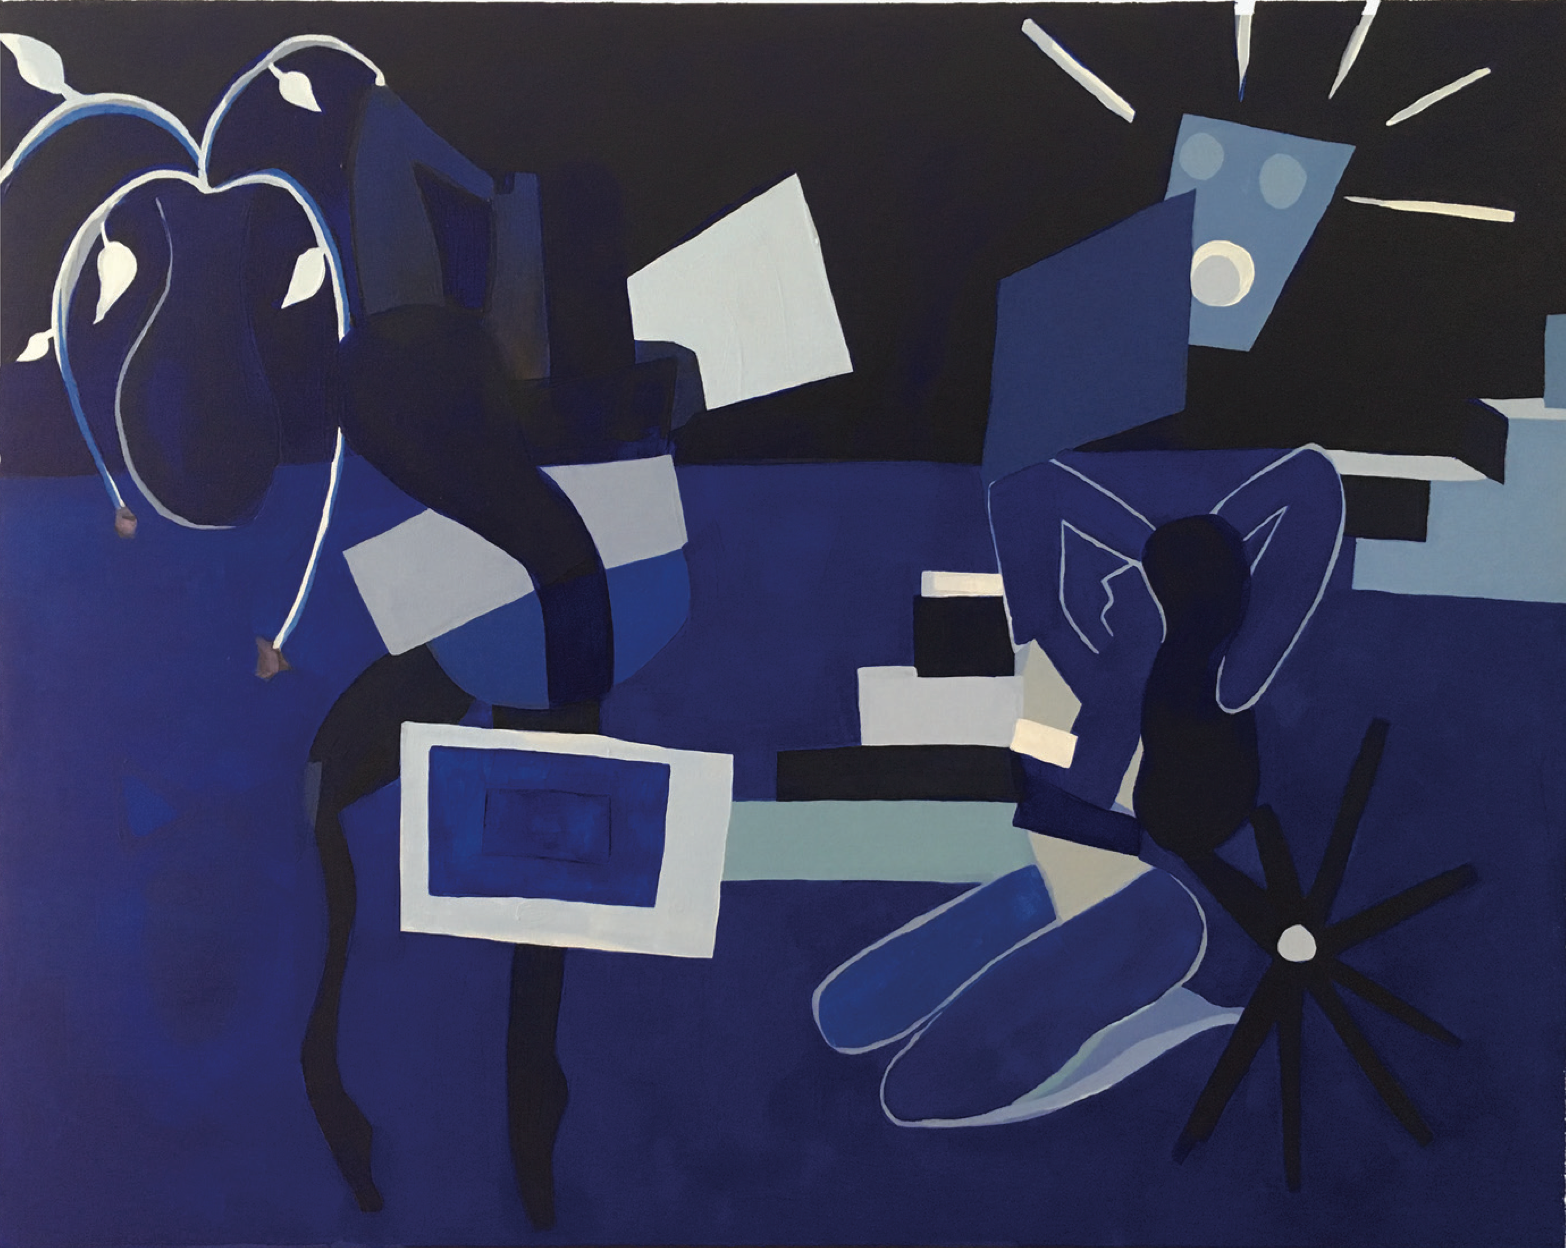 Franziska Barczyk,  Nights , 2018, acrylic on canvas, 36 x 48 inches  (inquire)